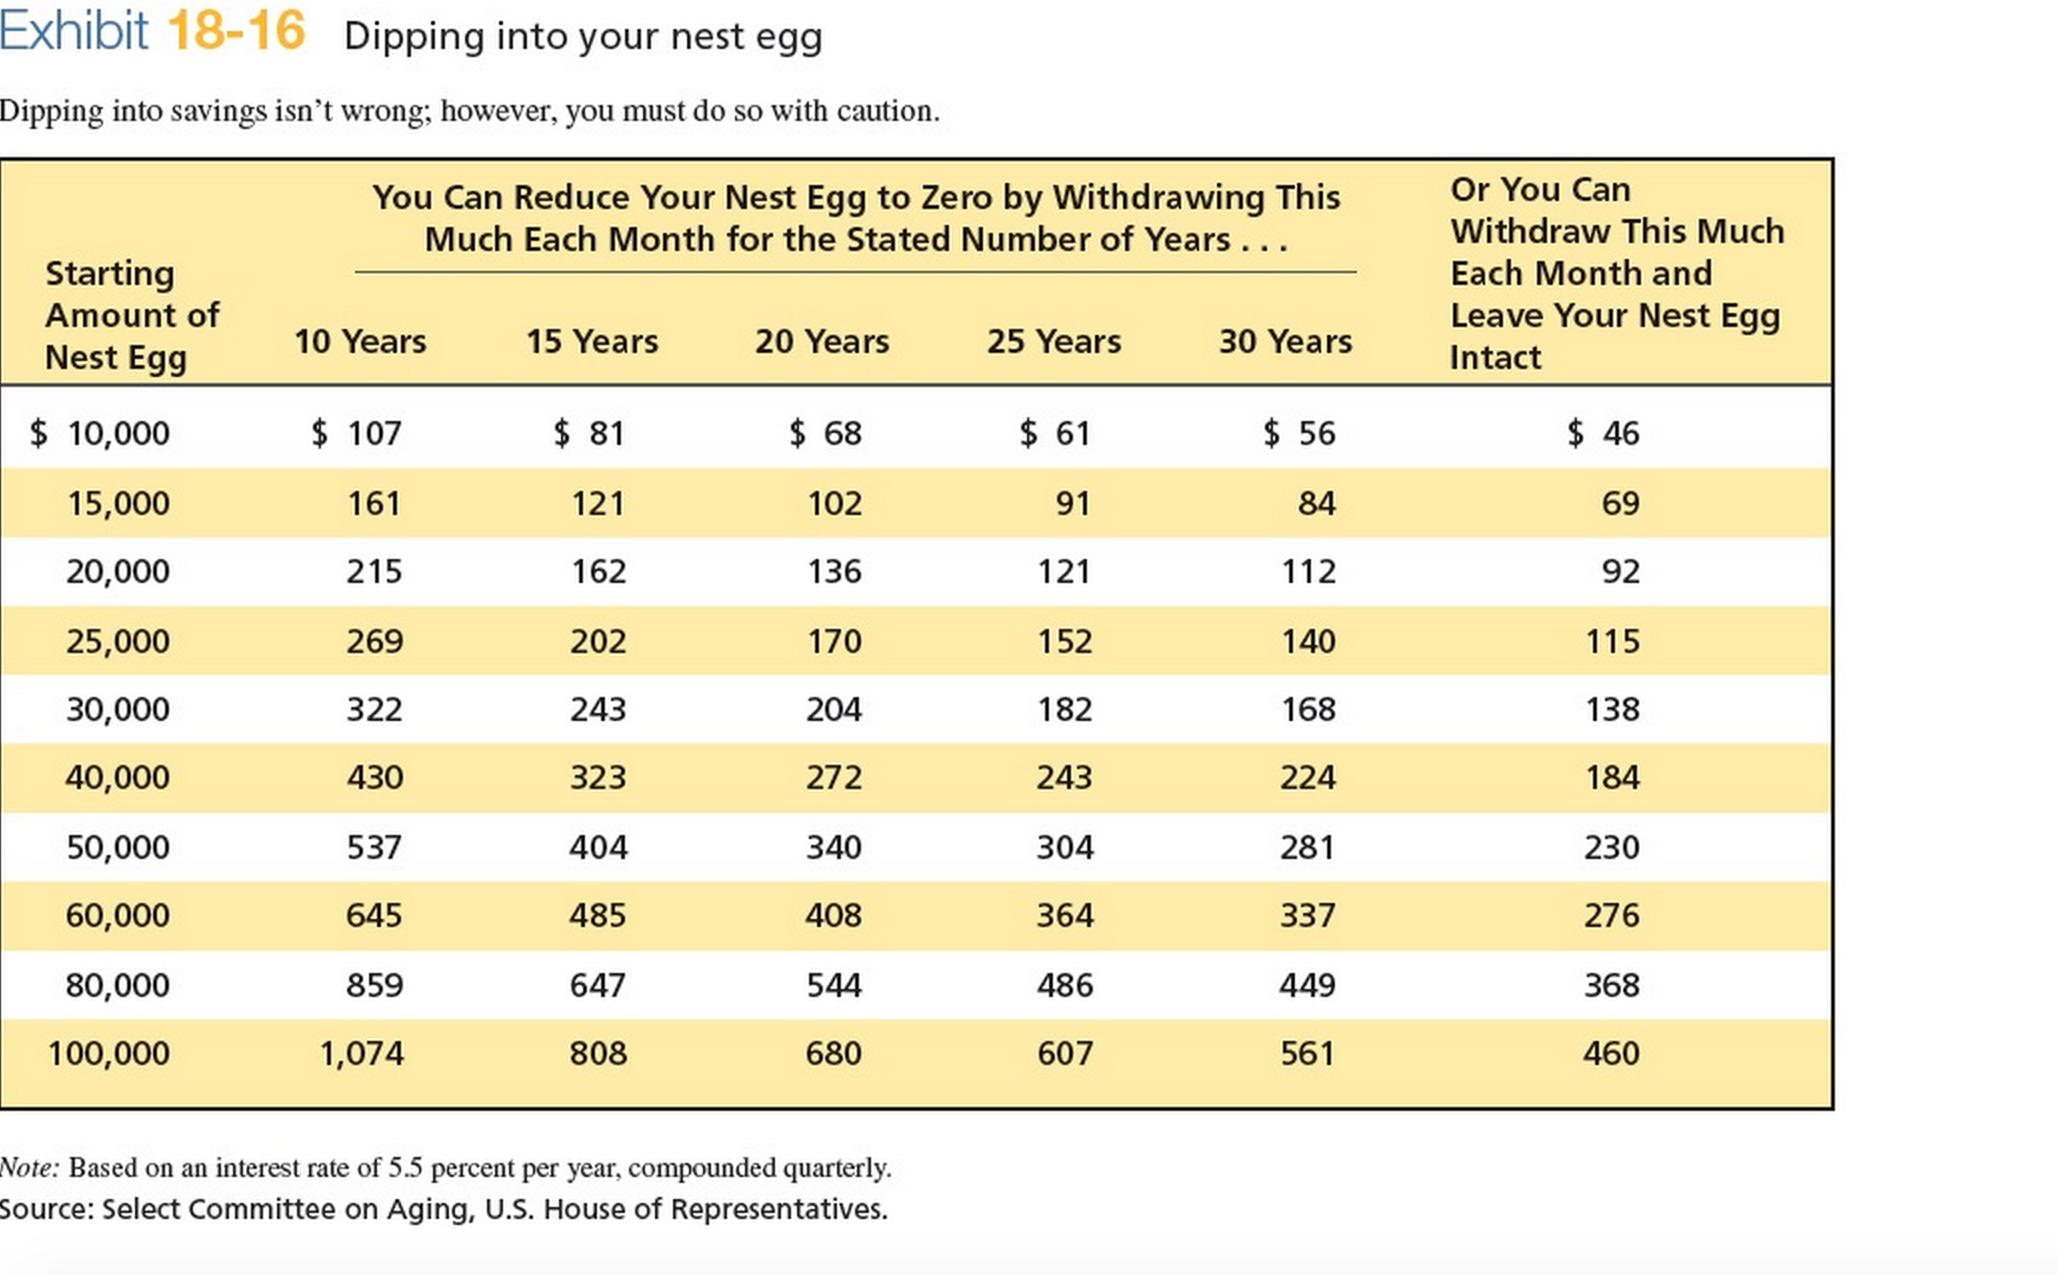 Homework help find percent savings